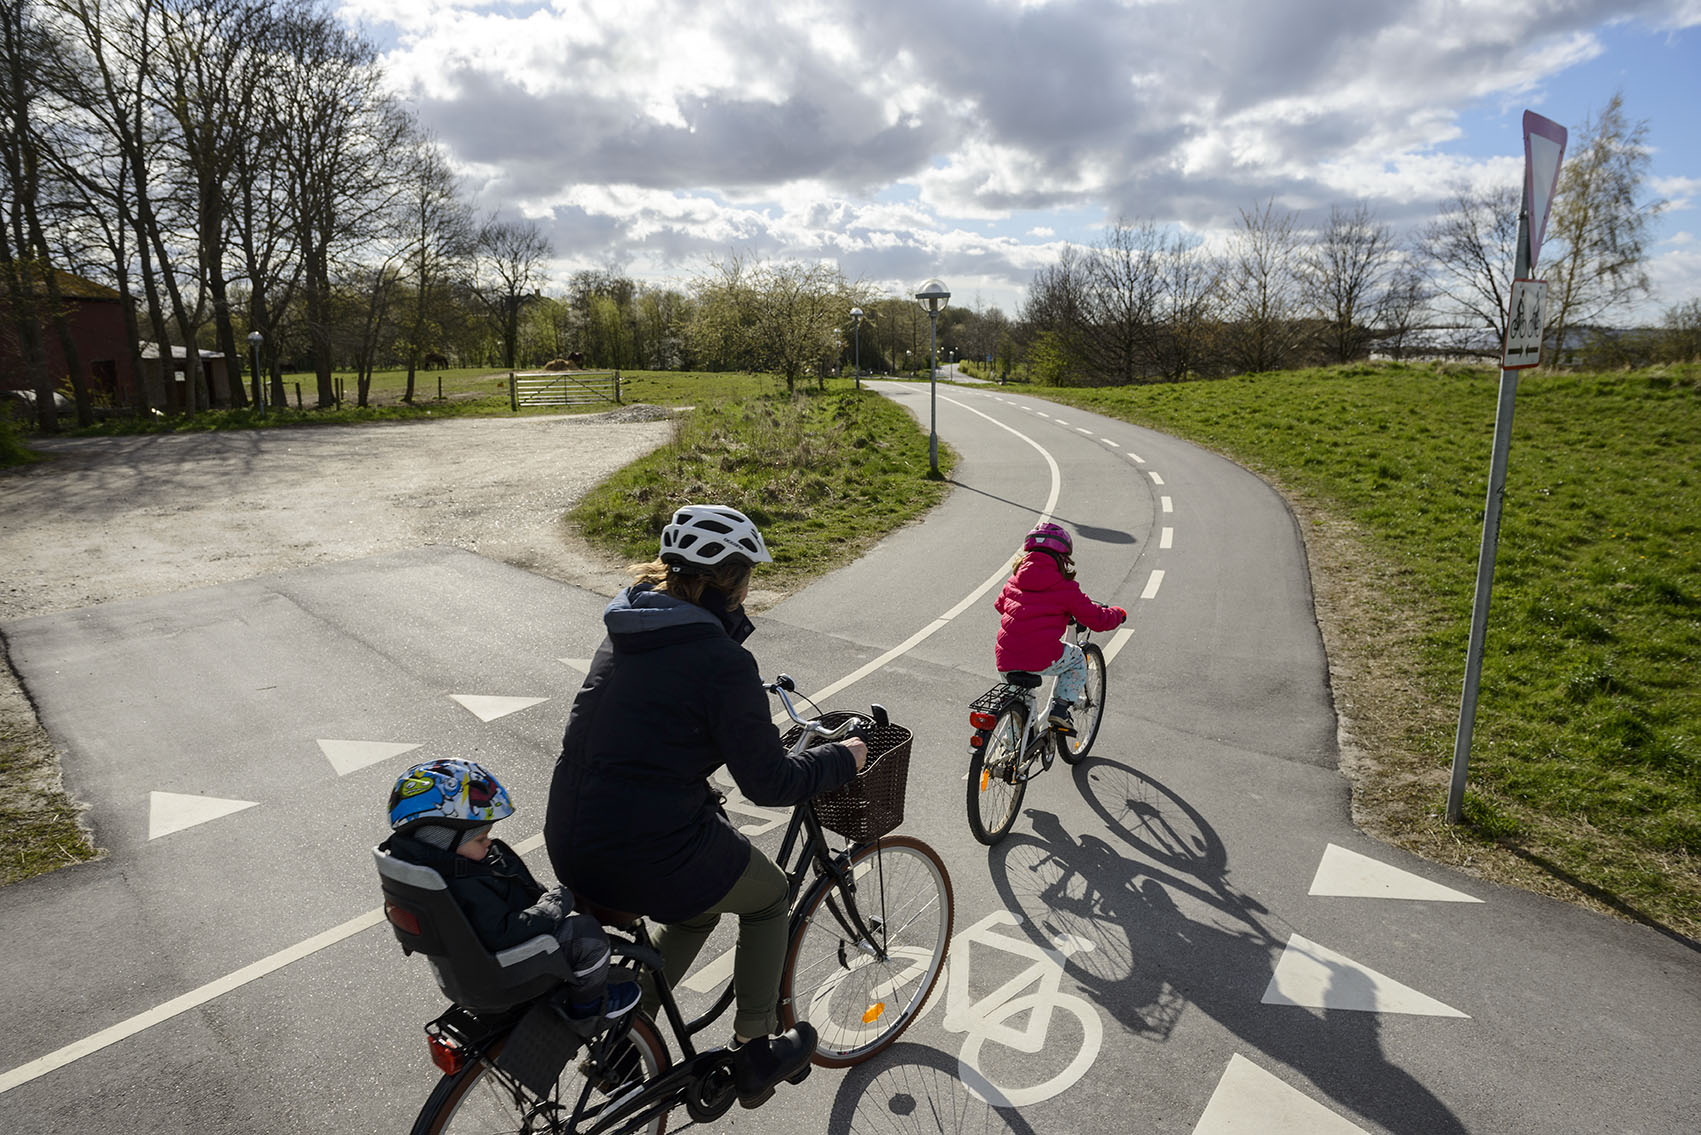 Família dinamarquesa andando de bicicleta